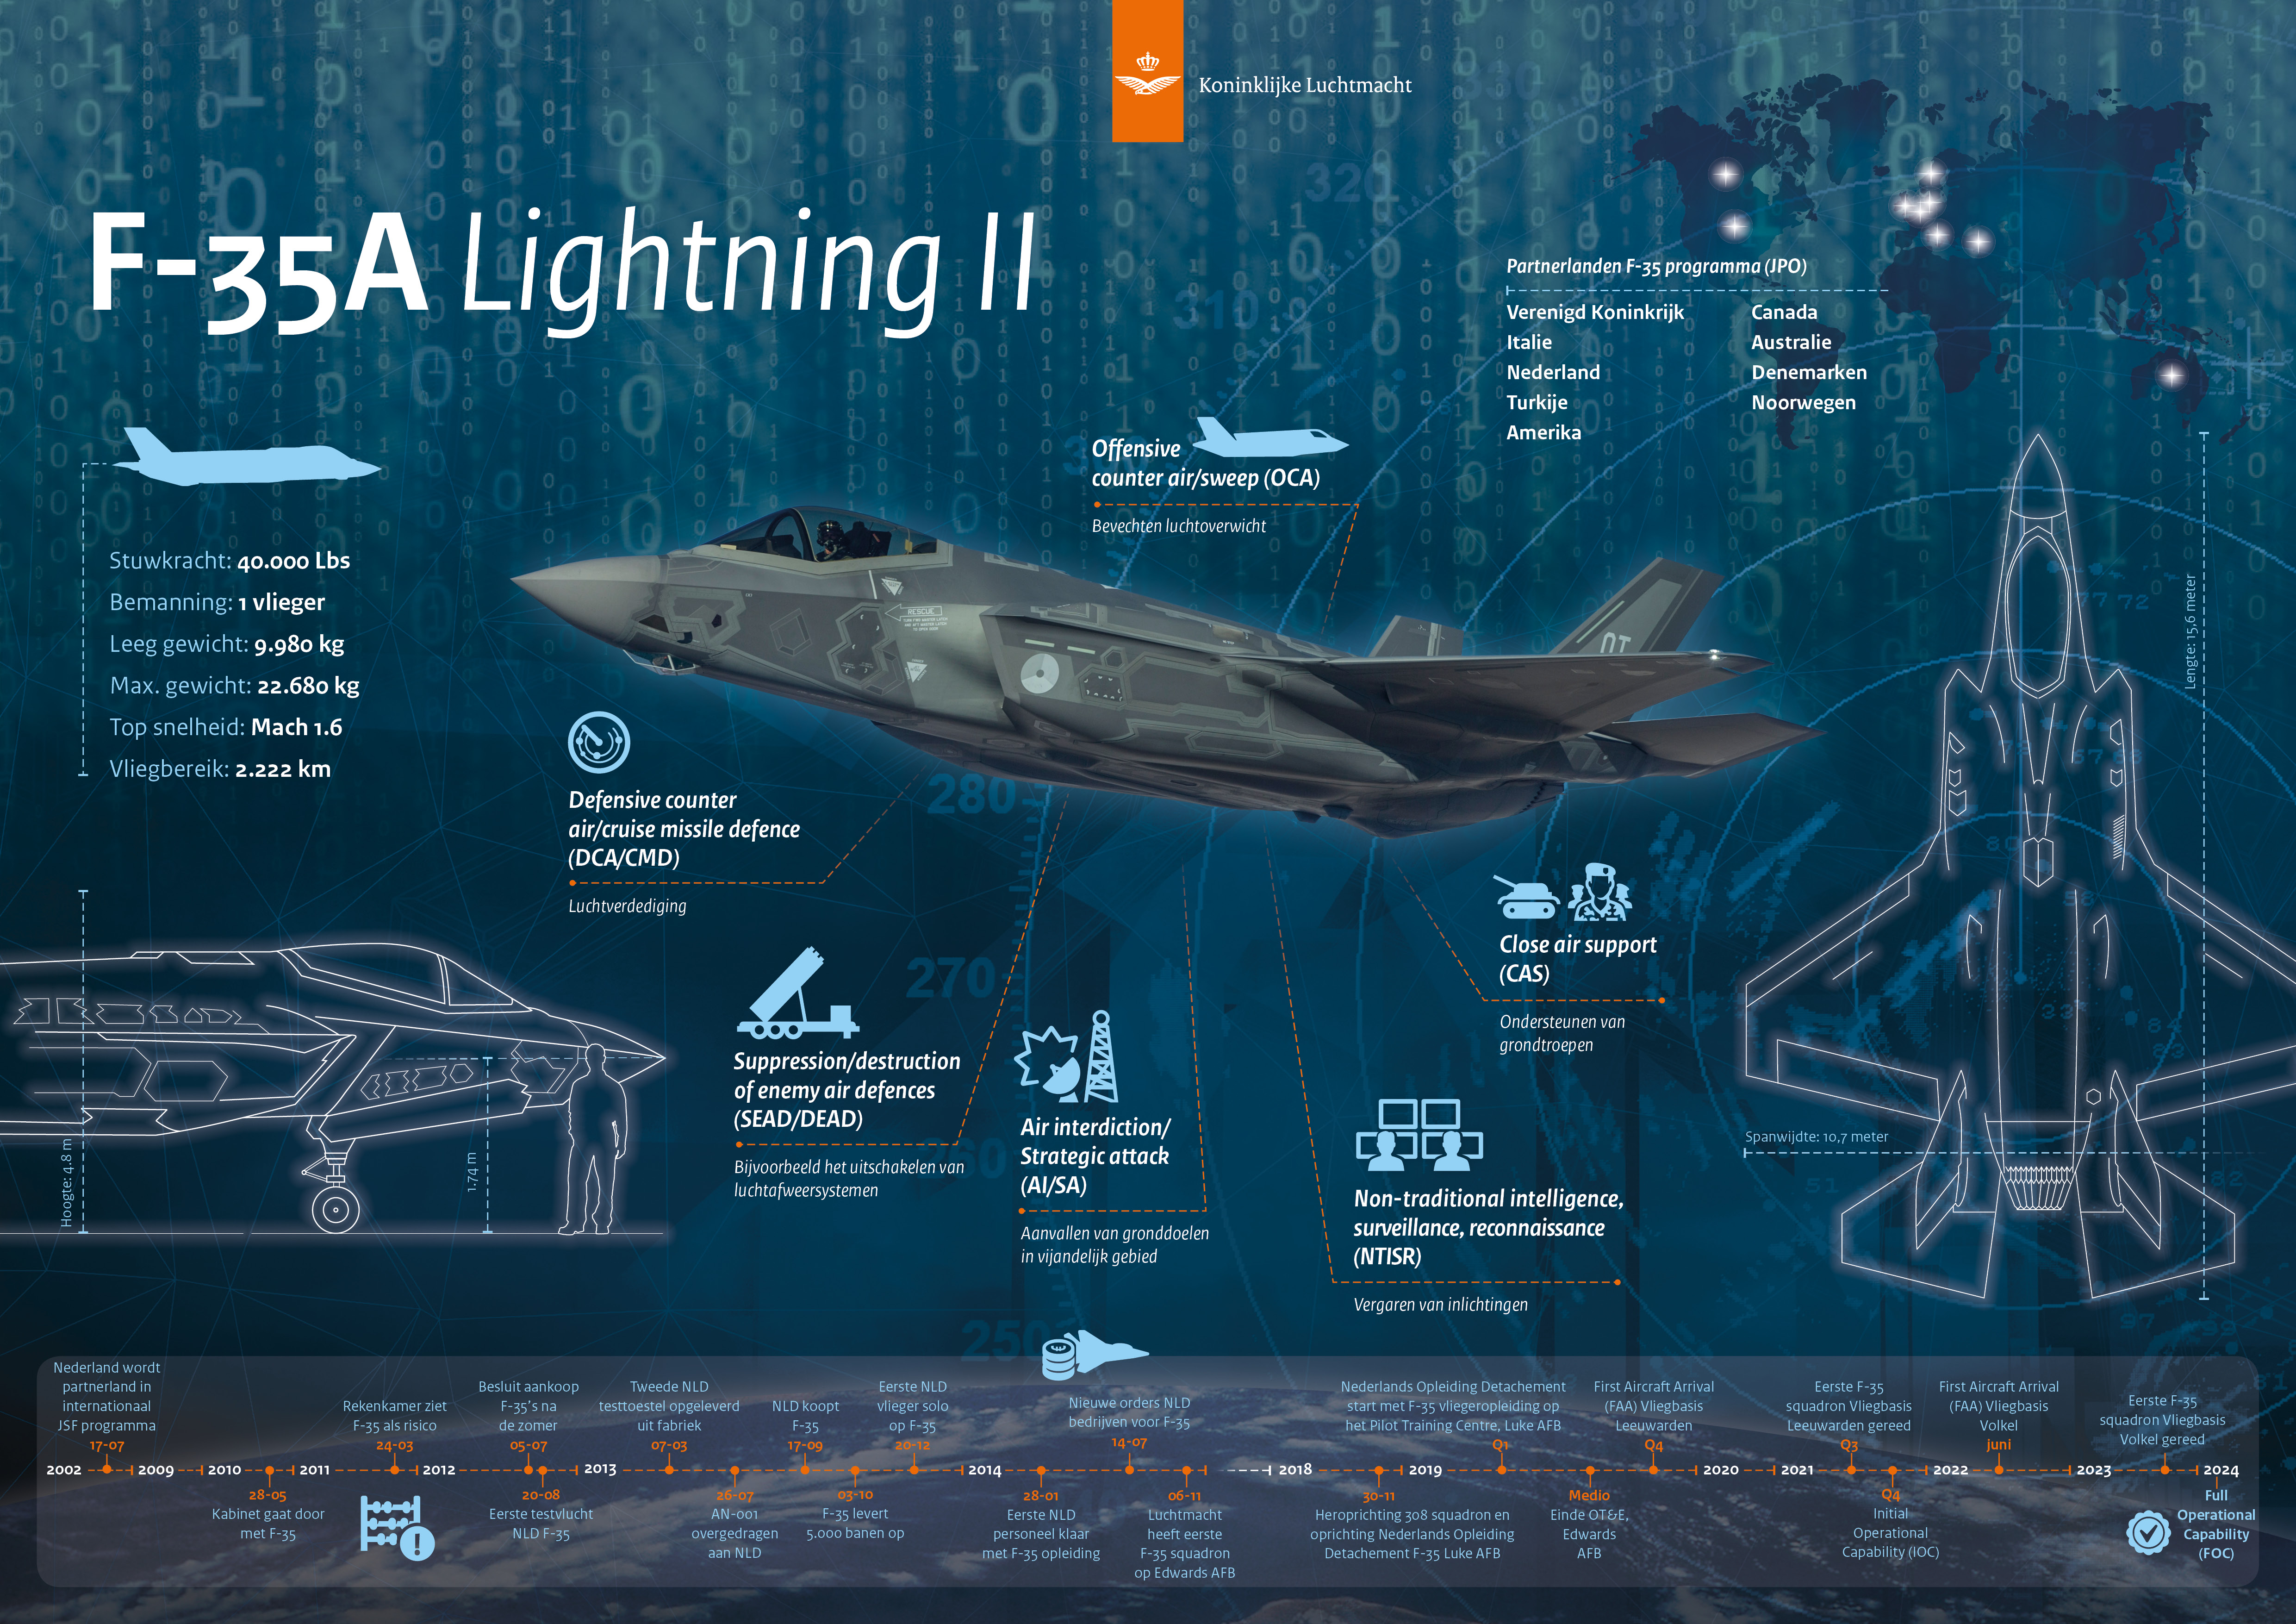 KLu infographic F-35 Lightning II